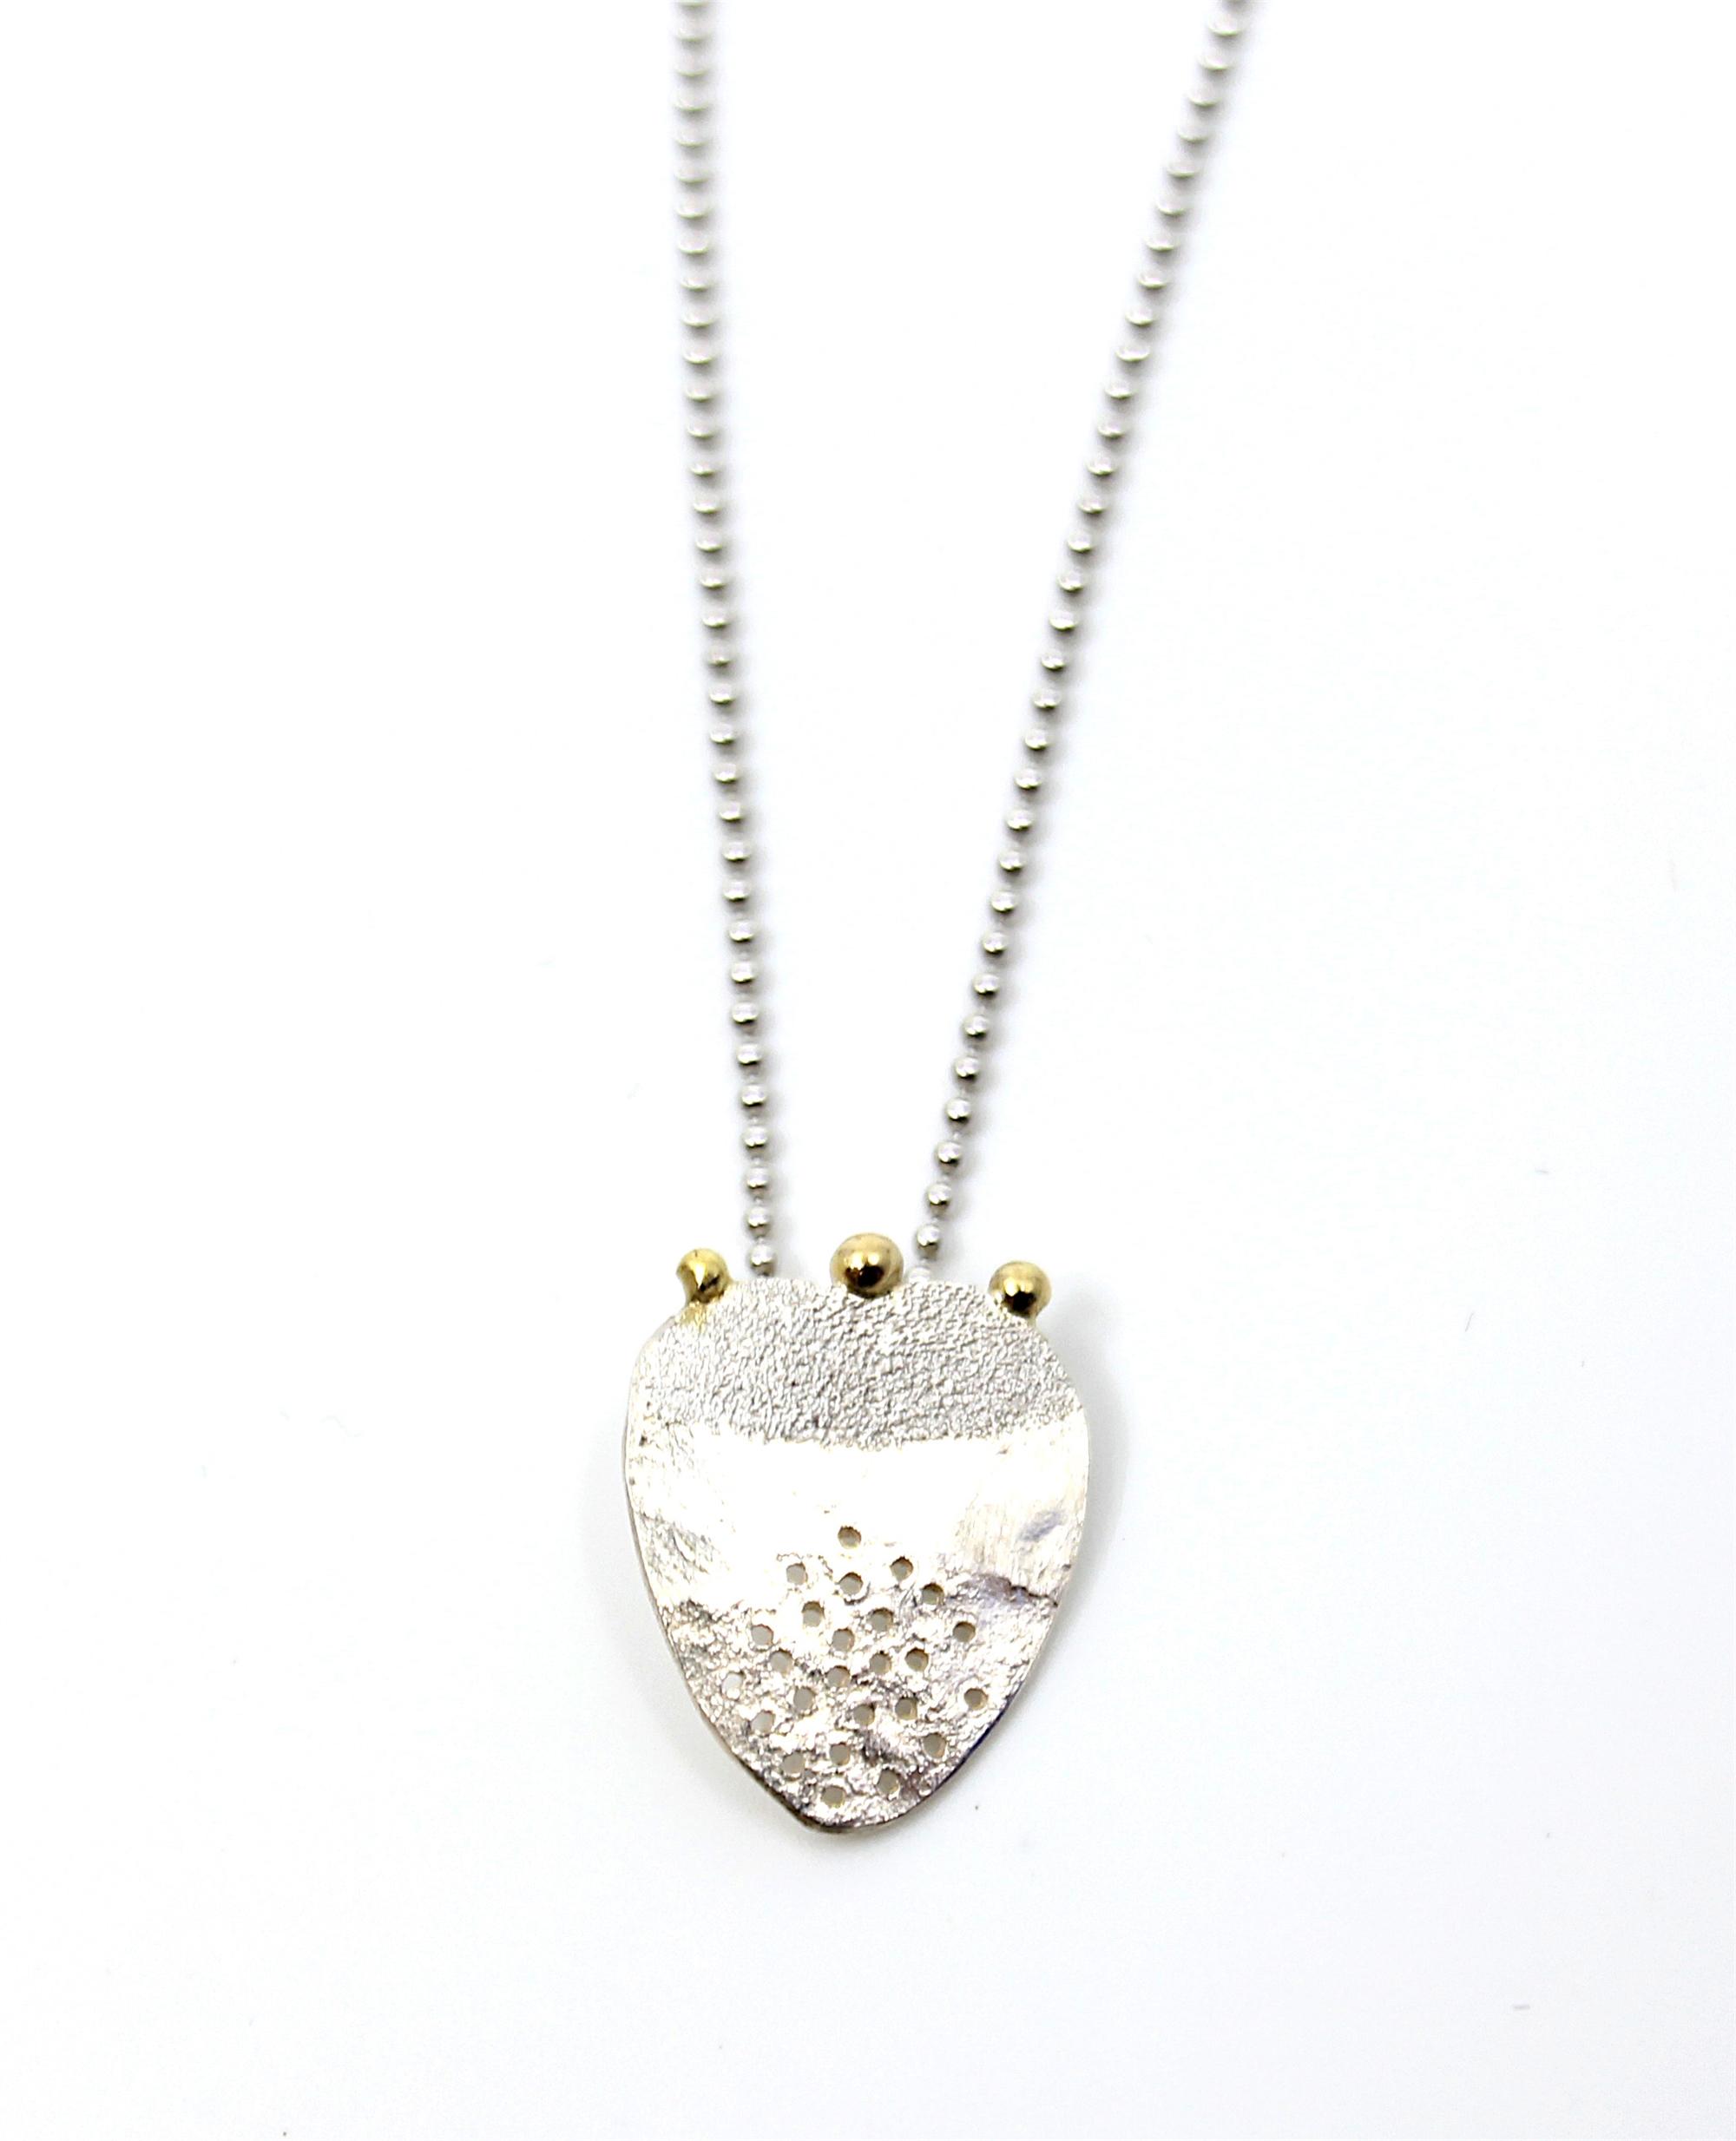 Mint Pendant by Leia Zumbro